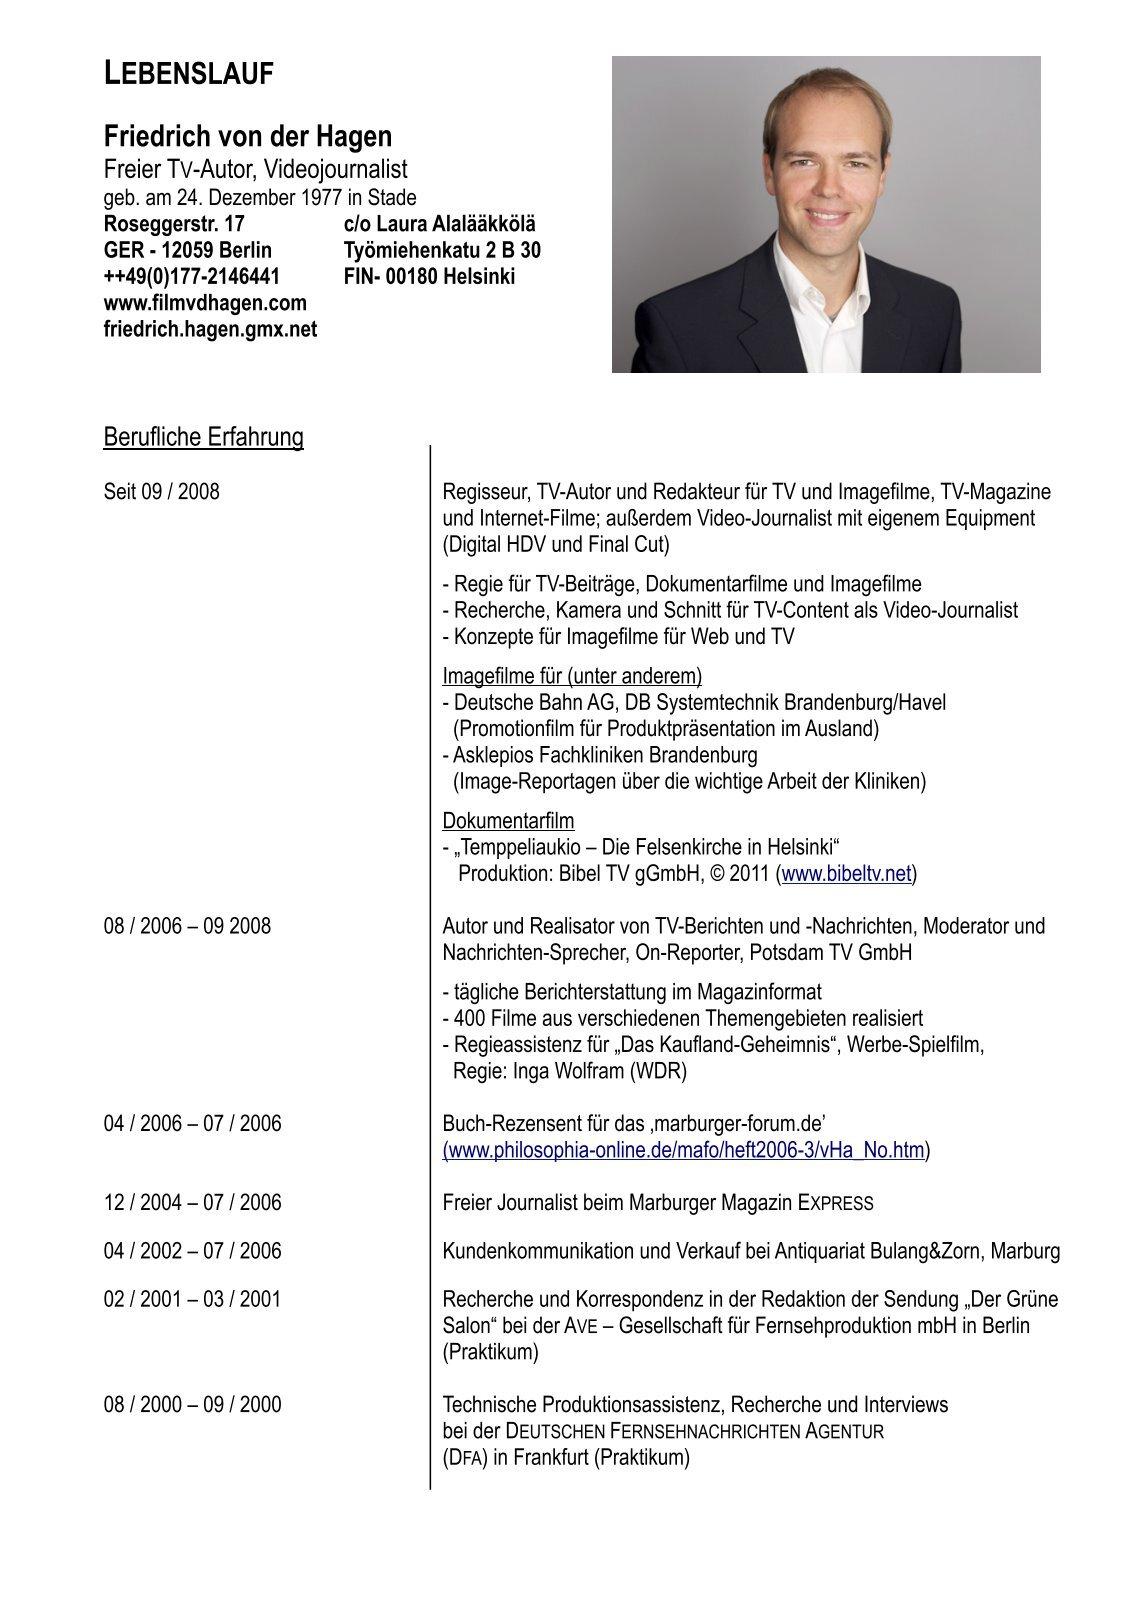 Groß Tv Nachrichtenredaktion Lebenslauf Fotos - Entry Level Resume ...